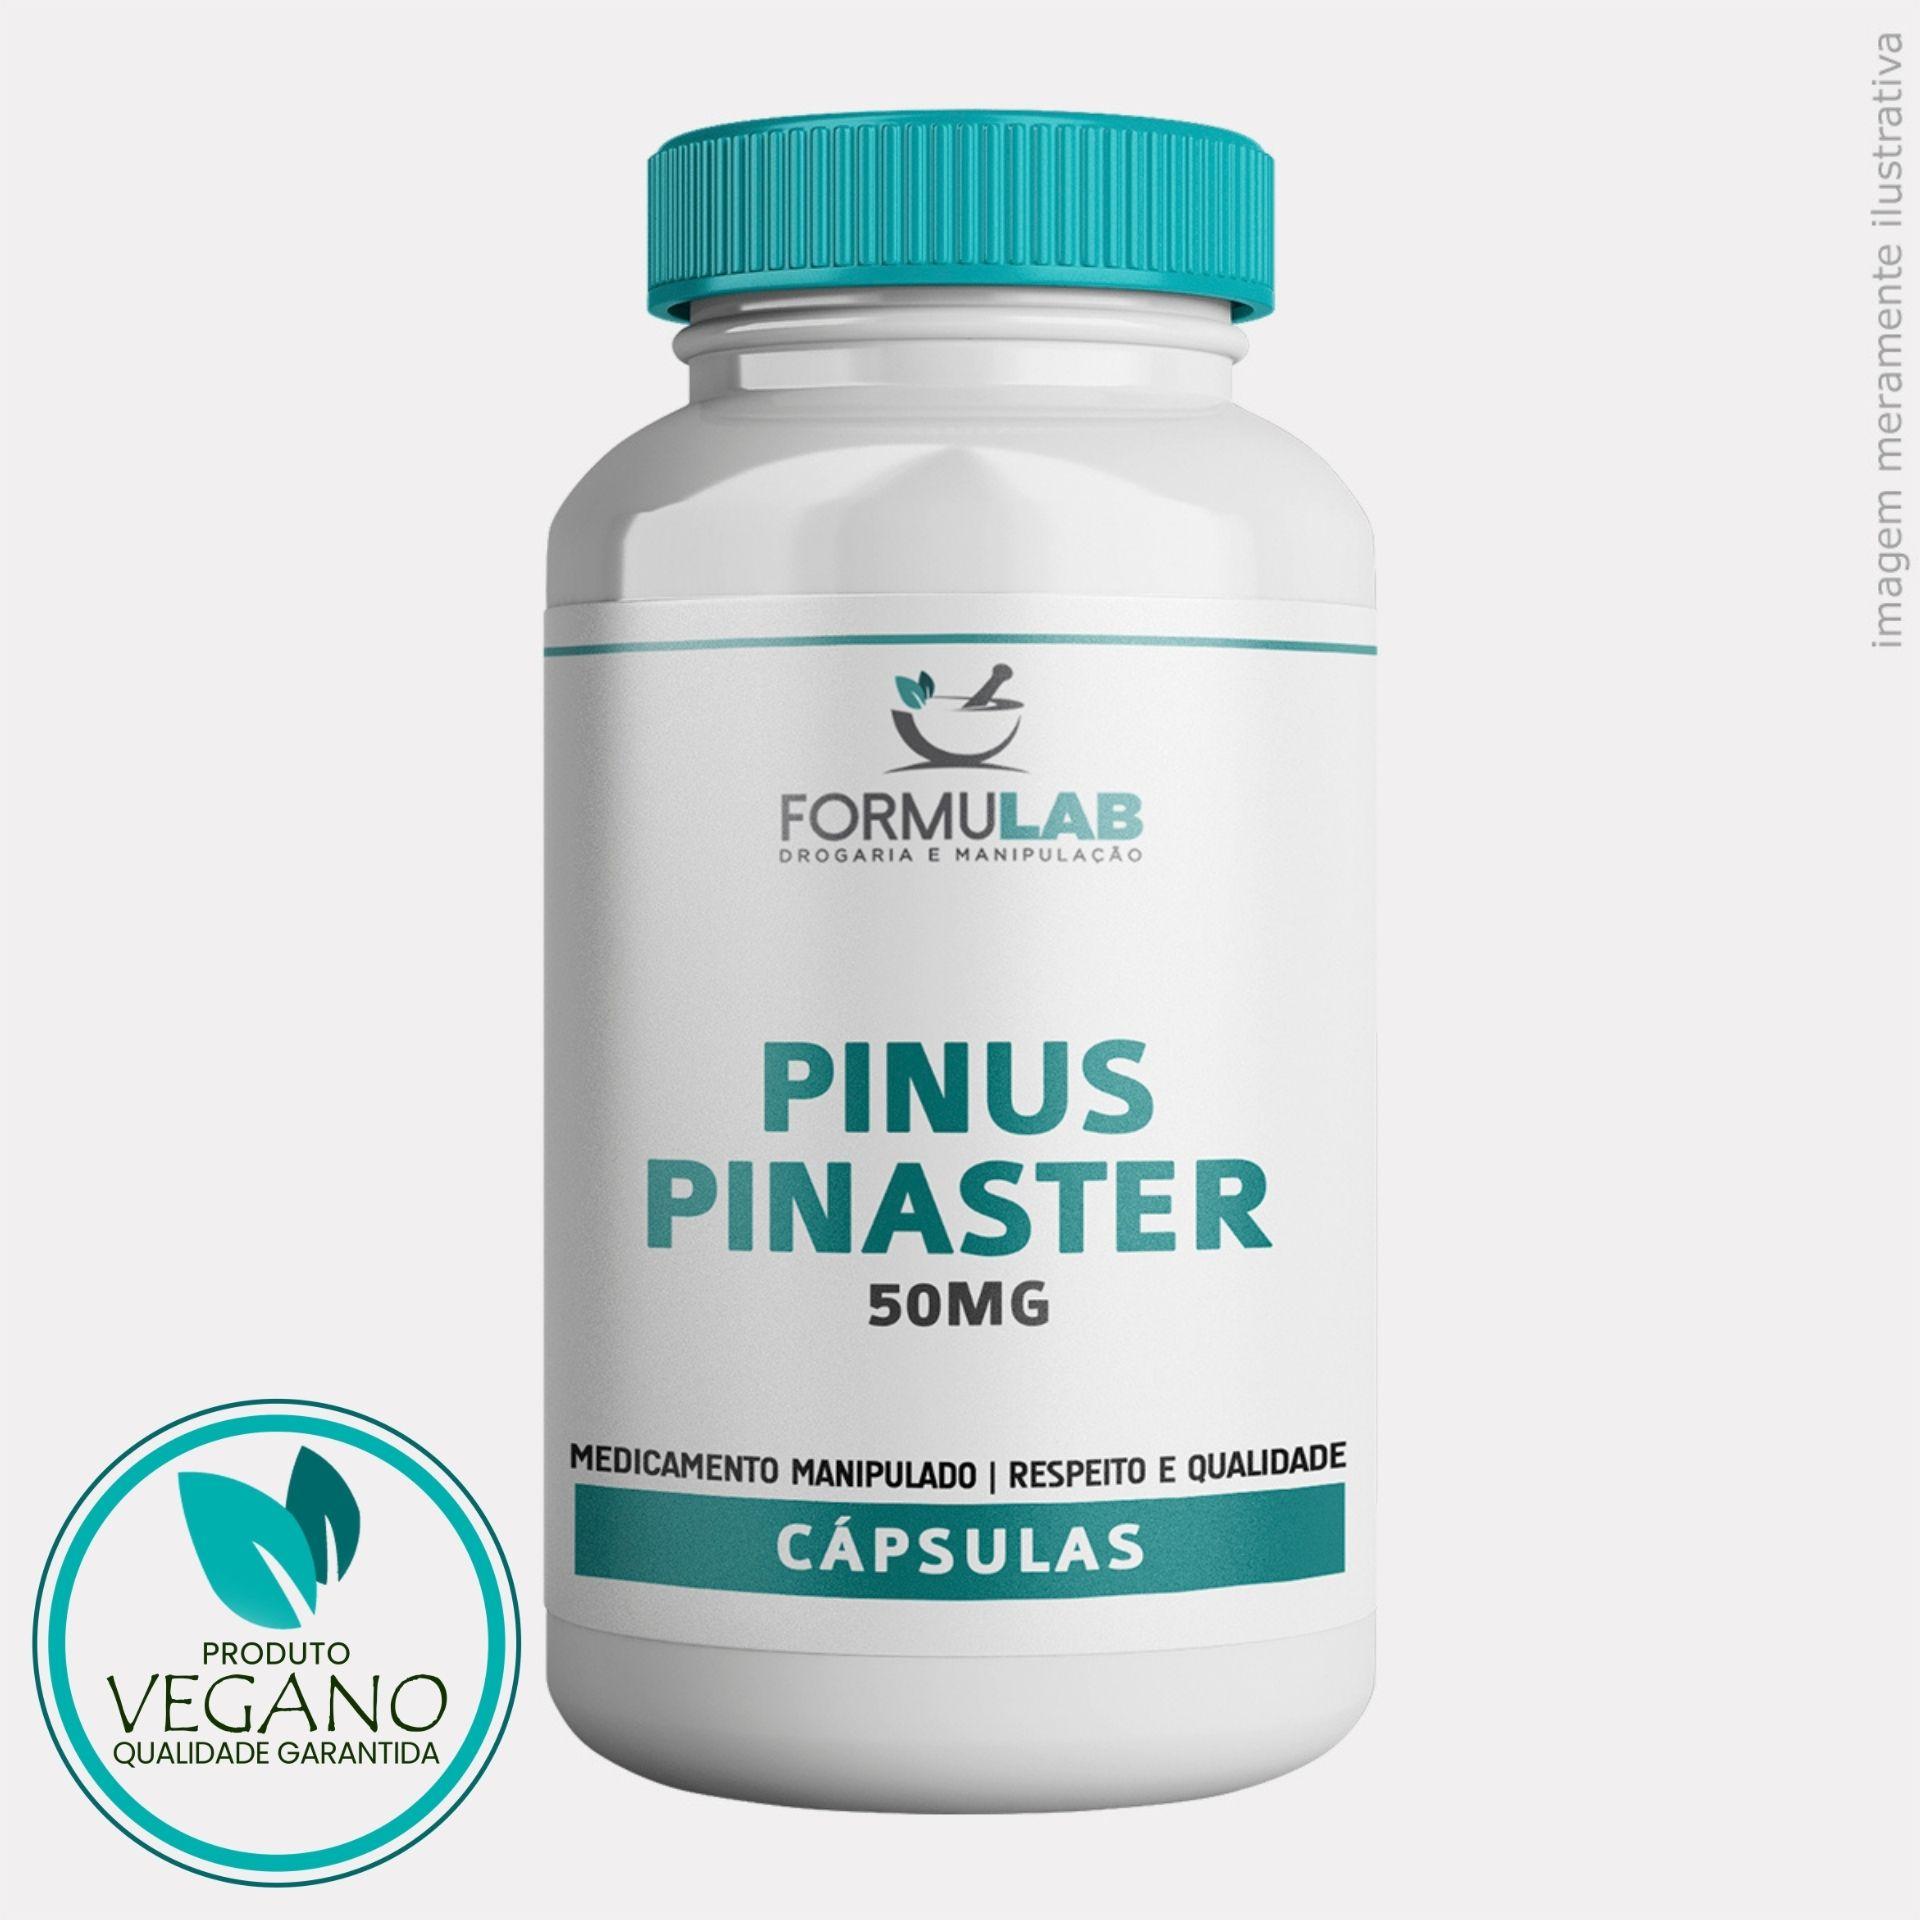 Pinus Pinaster 50mg - Picnogenol VEGANO